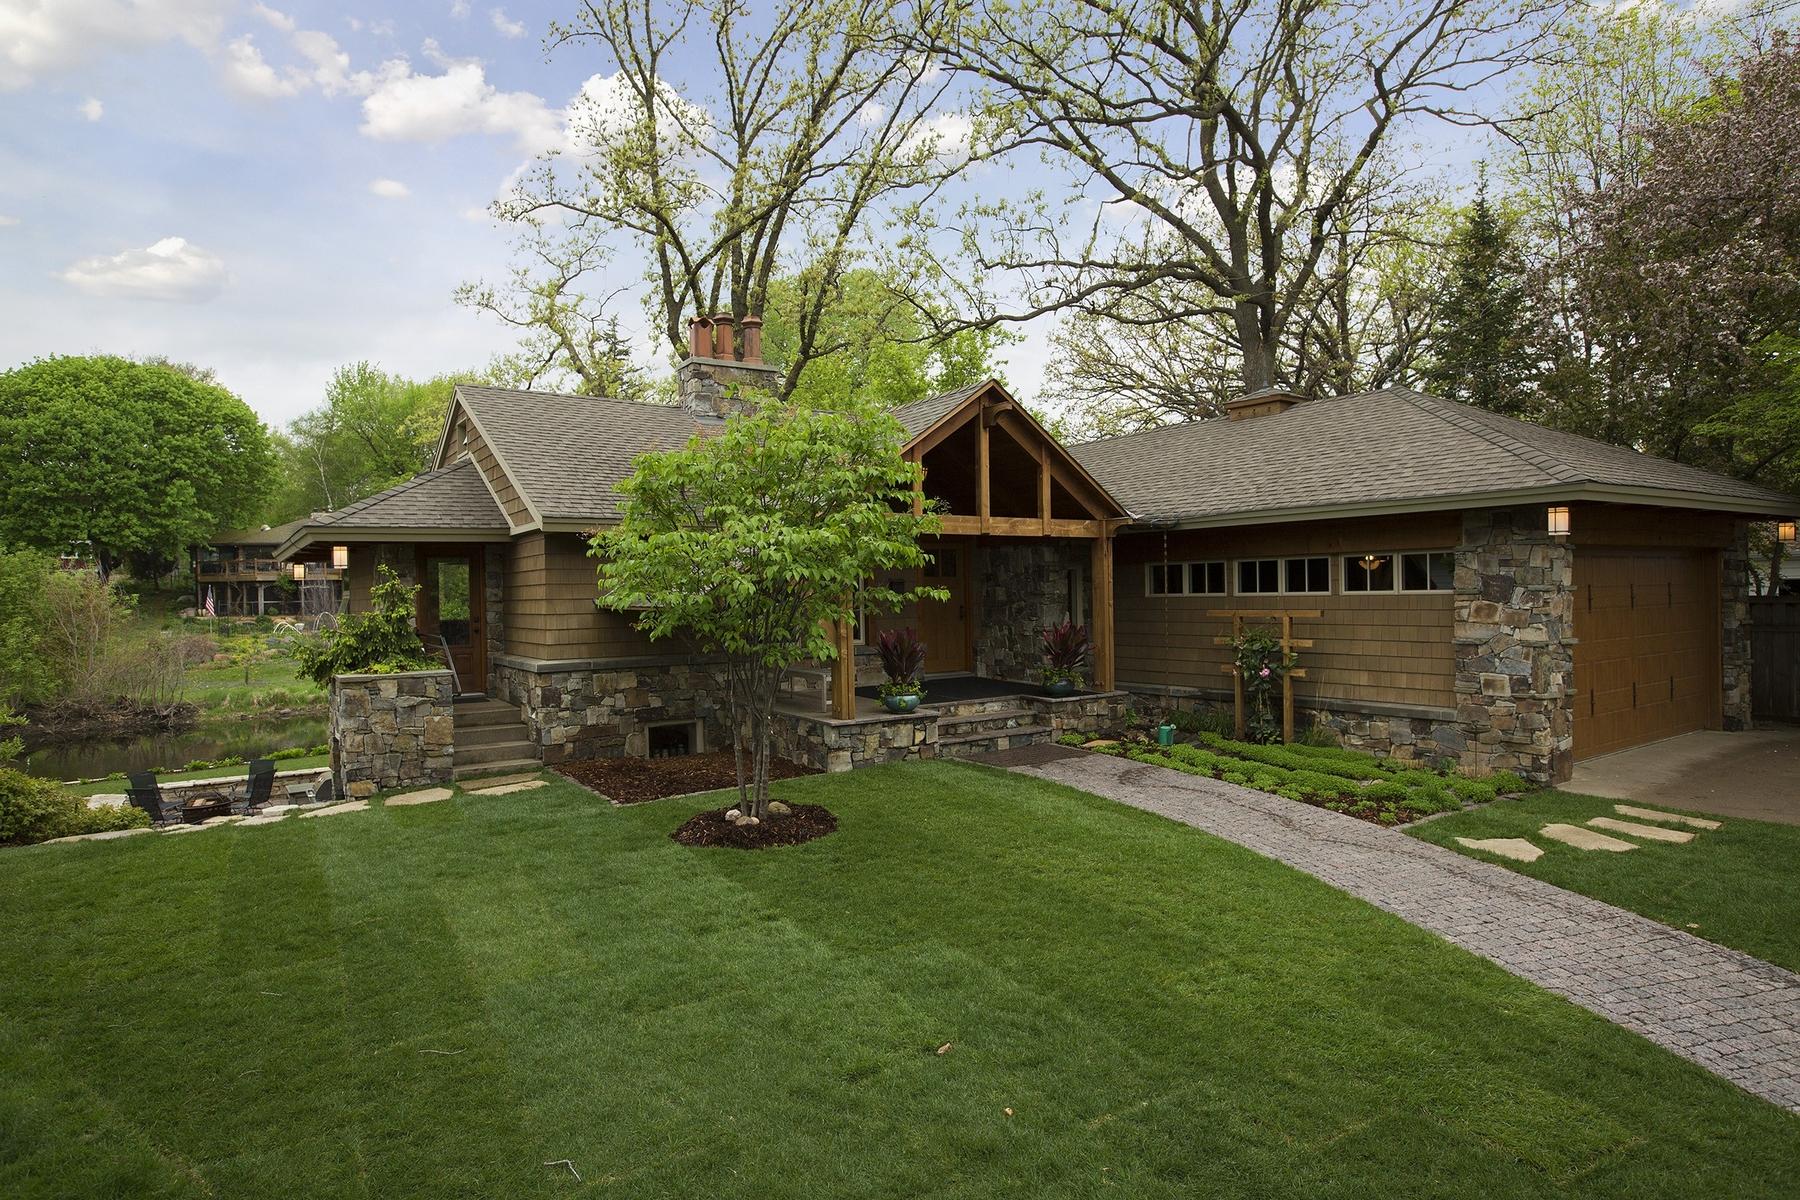 Single Family Home for Sale at 4610 Cascade Lane Edina, Minnesota 55436 United States